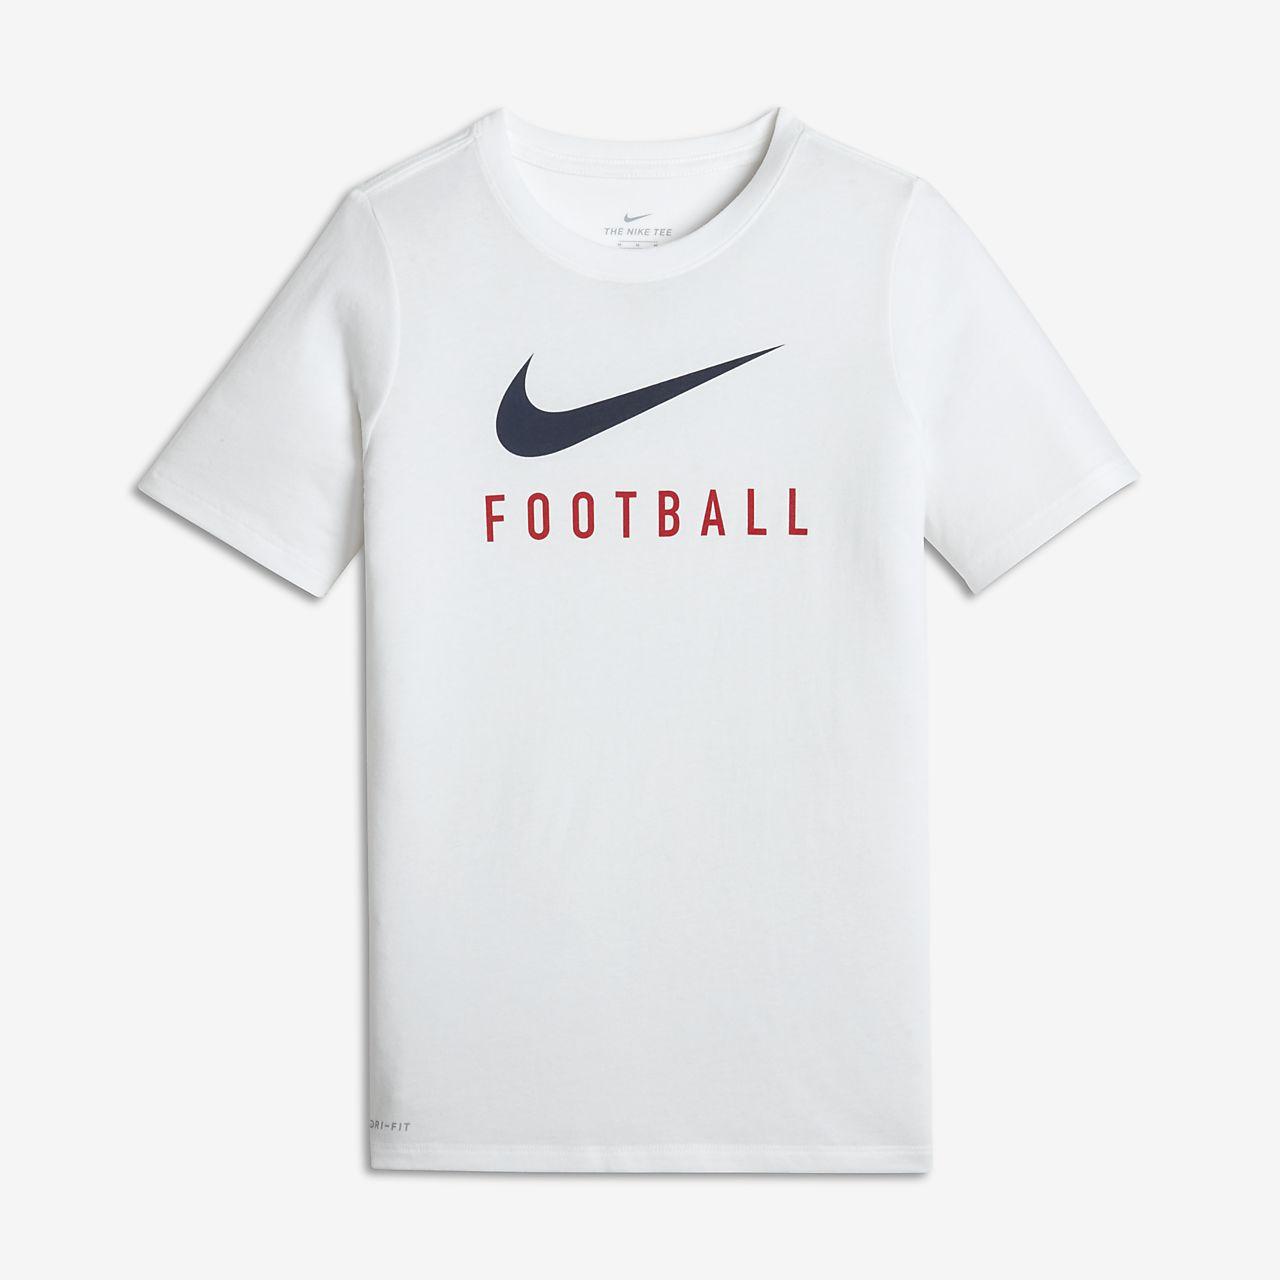 fd5b668d Nike Dri-FIT fotball-T-skjorte til store barn (gutt). Nike.com NO